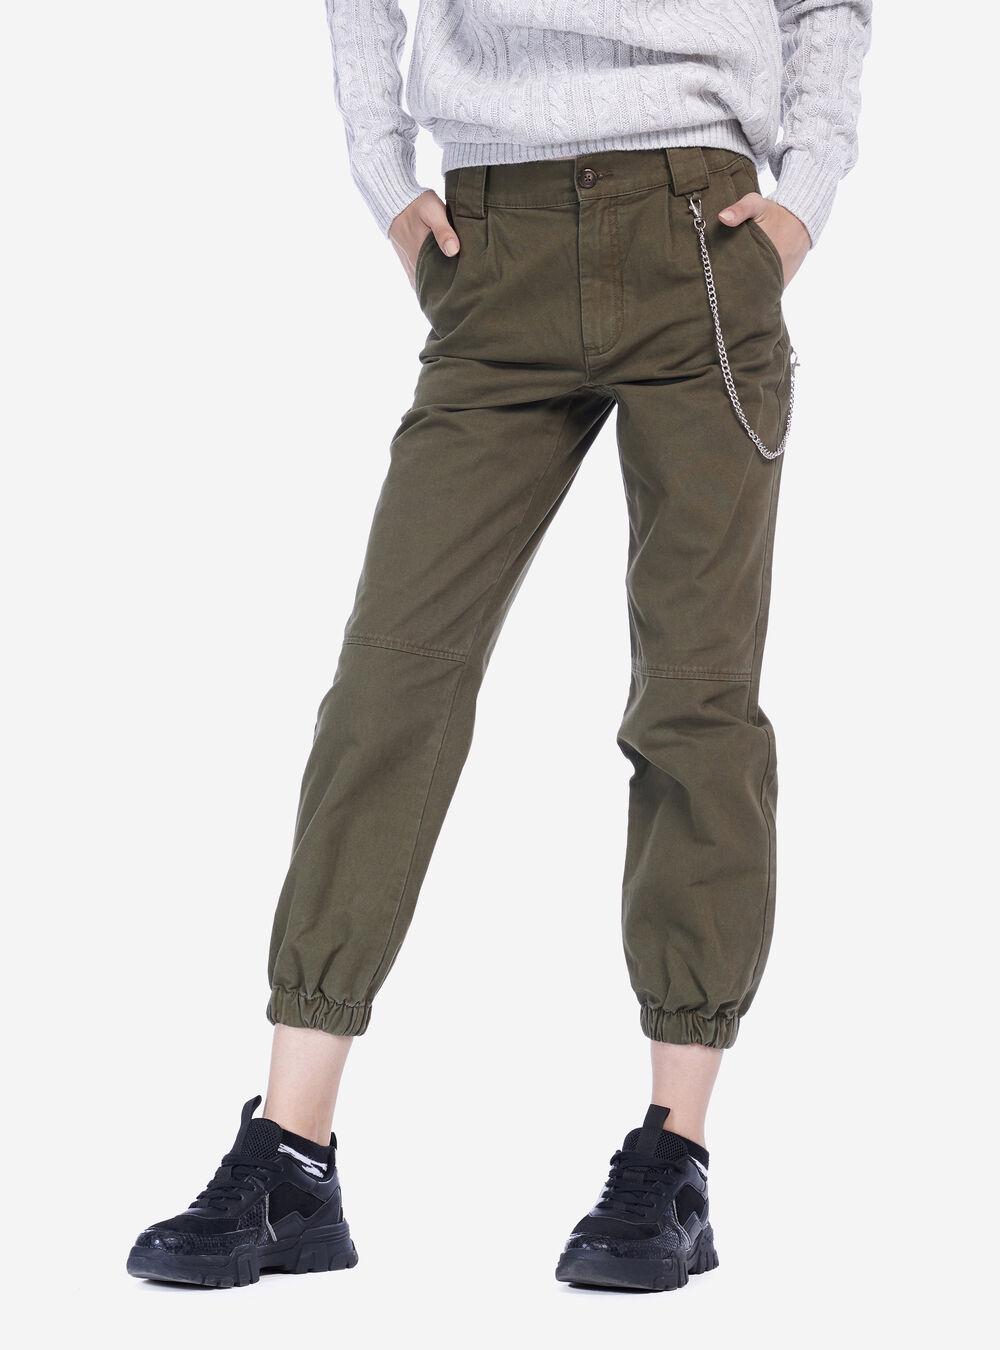 Circonferenza Ginnasta Lucernario  Pantaloni con elastico fondo